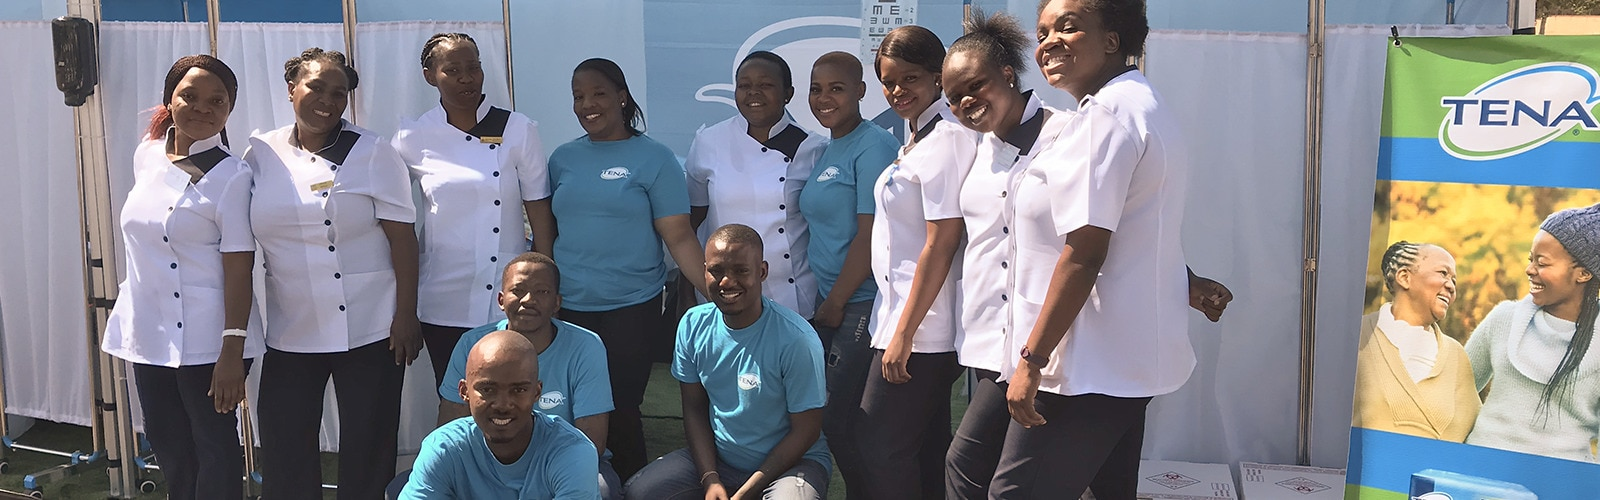 Équipe TENA à Banakekele